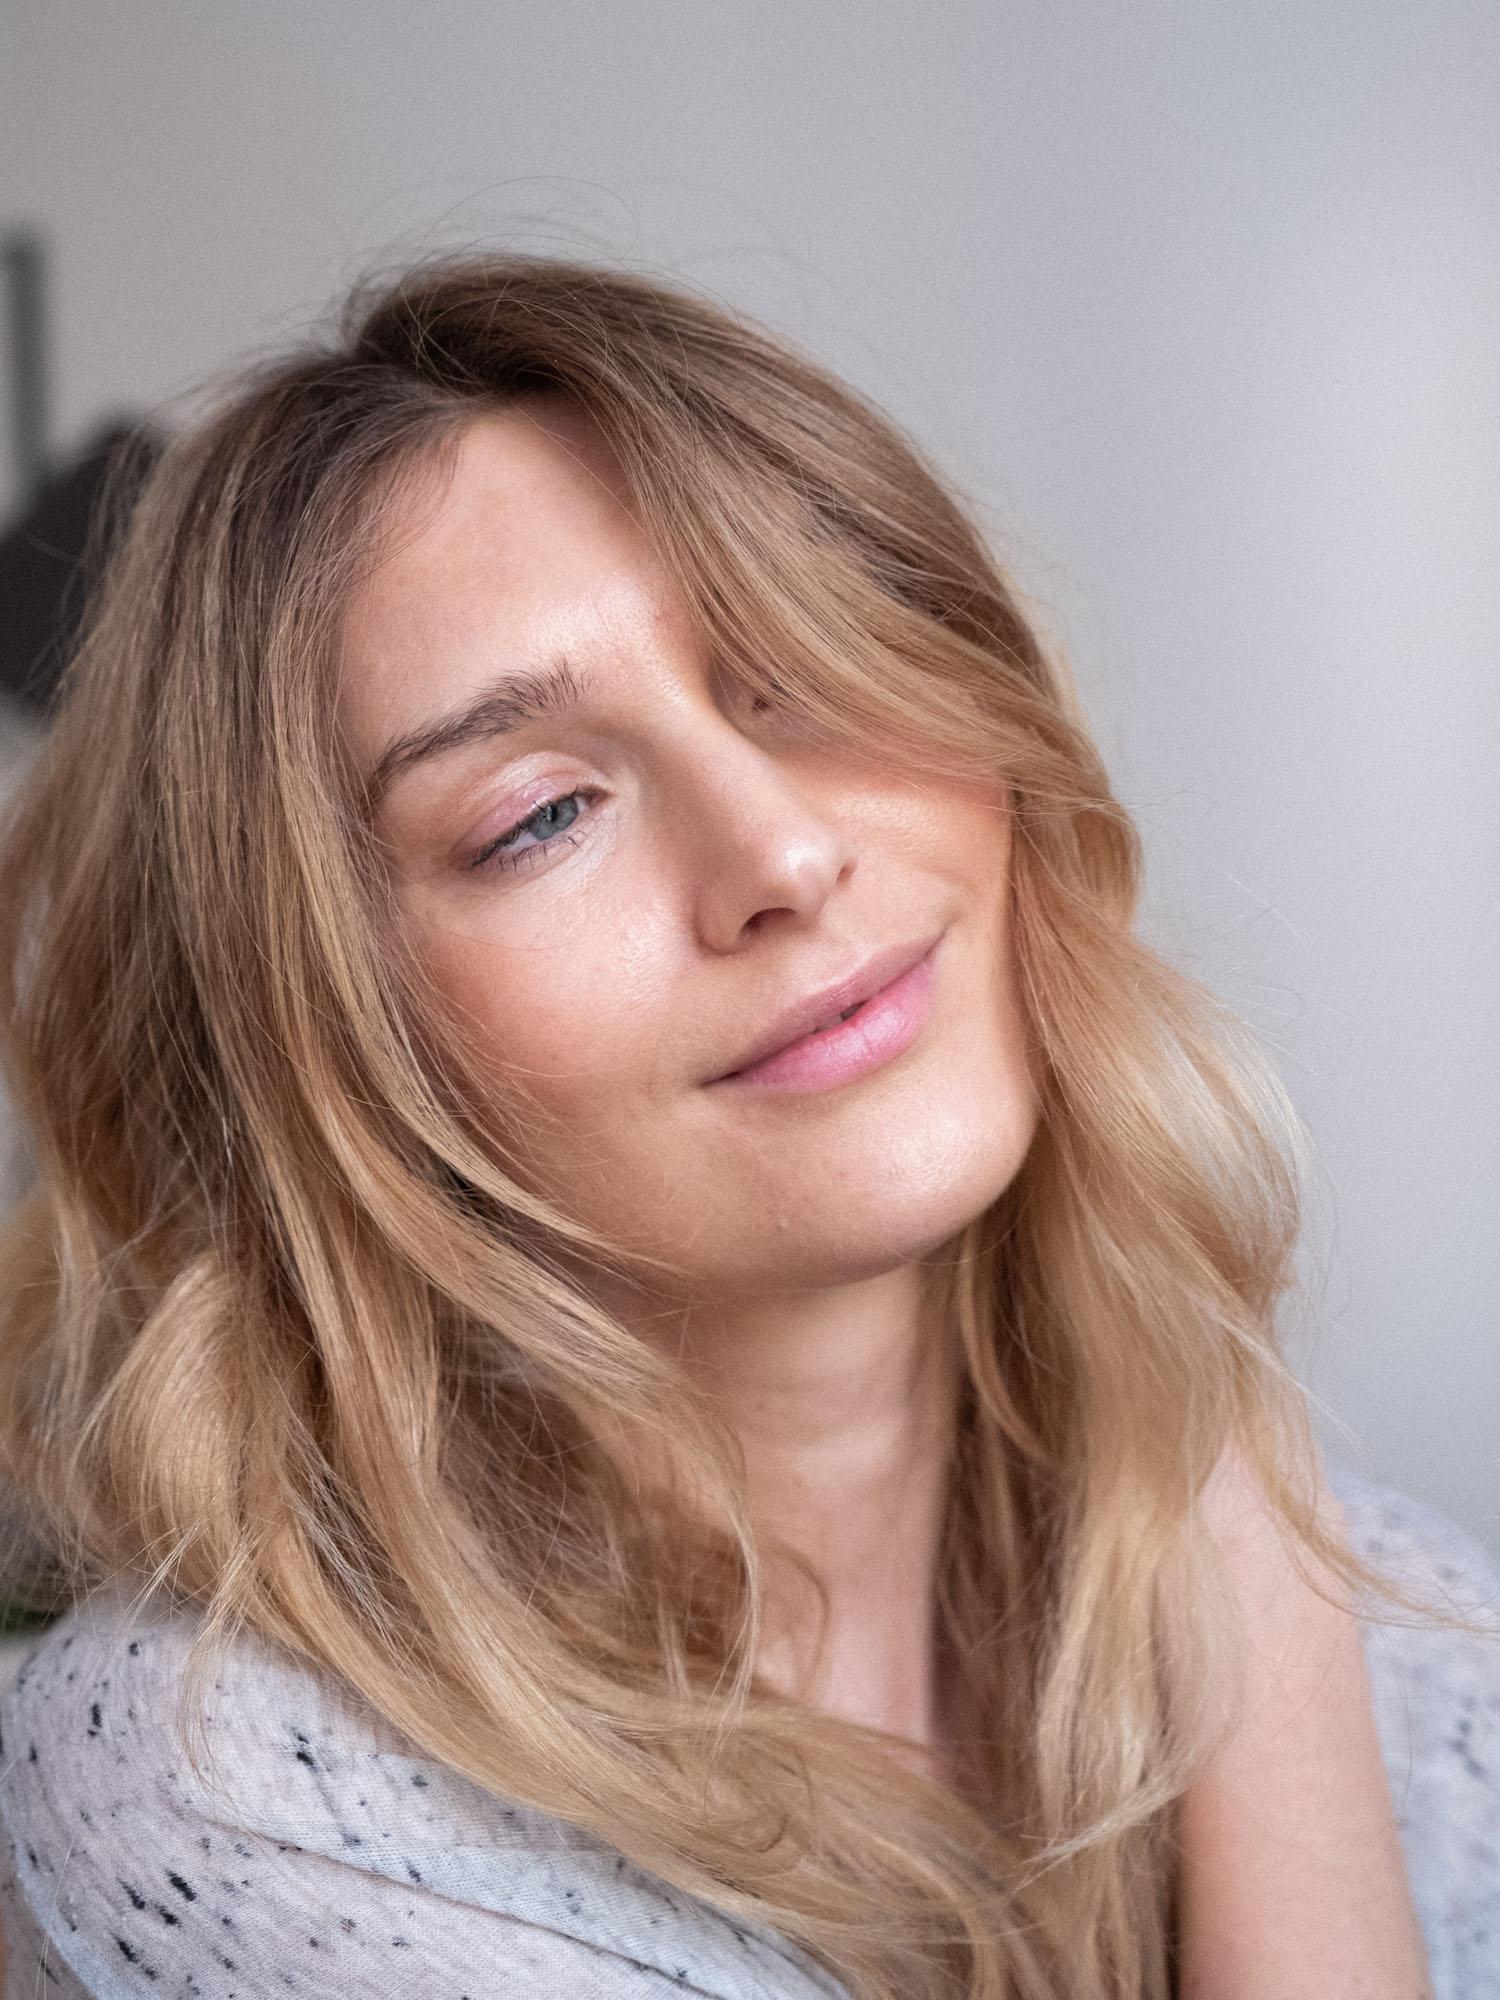 Beautyblog HydraFacial im Test